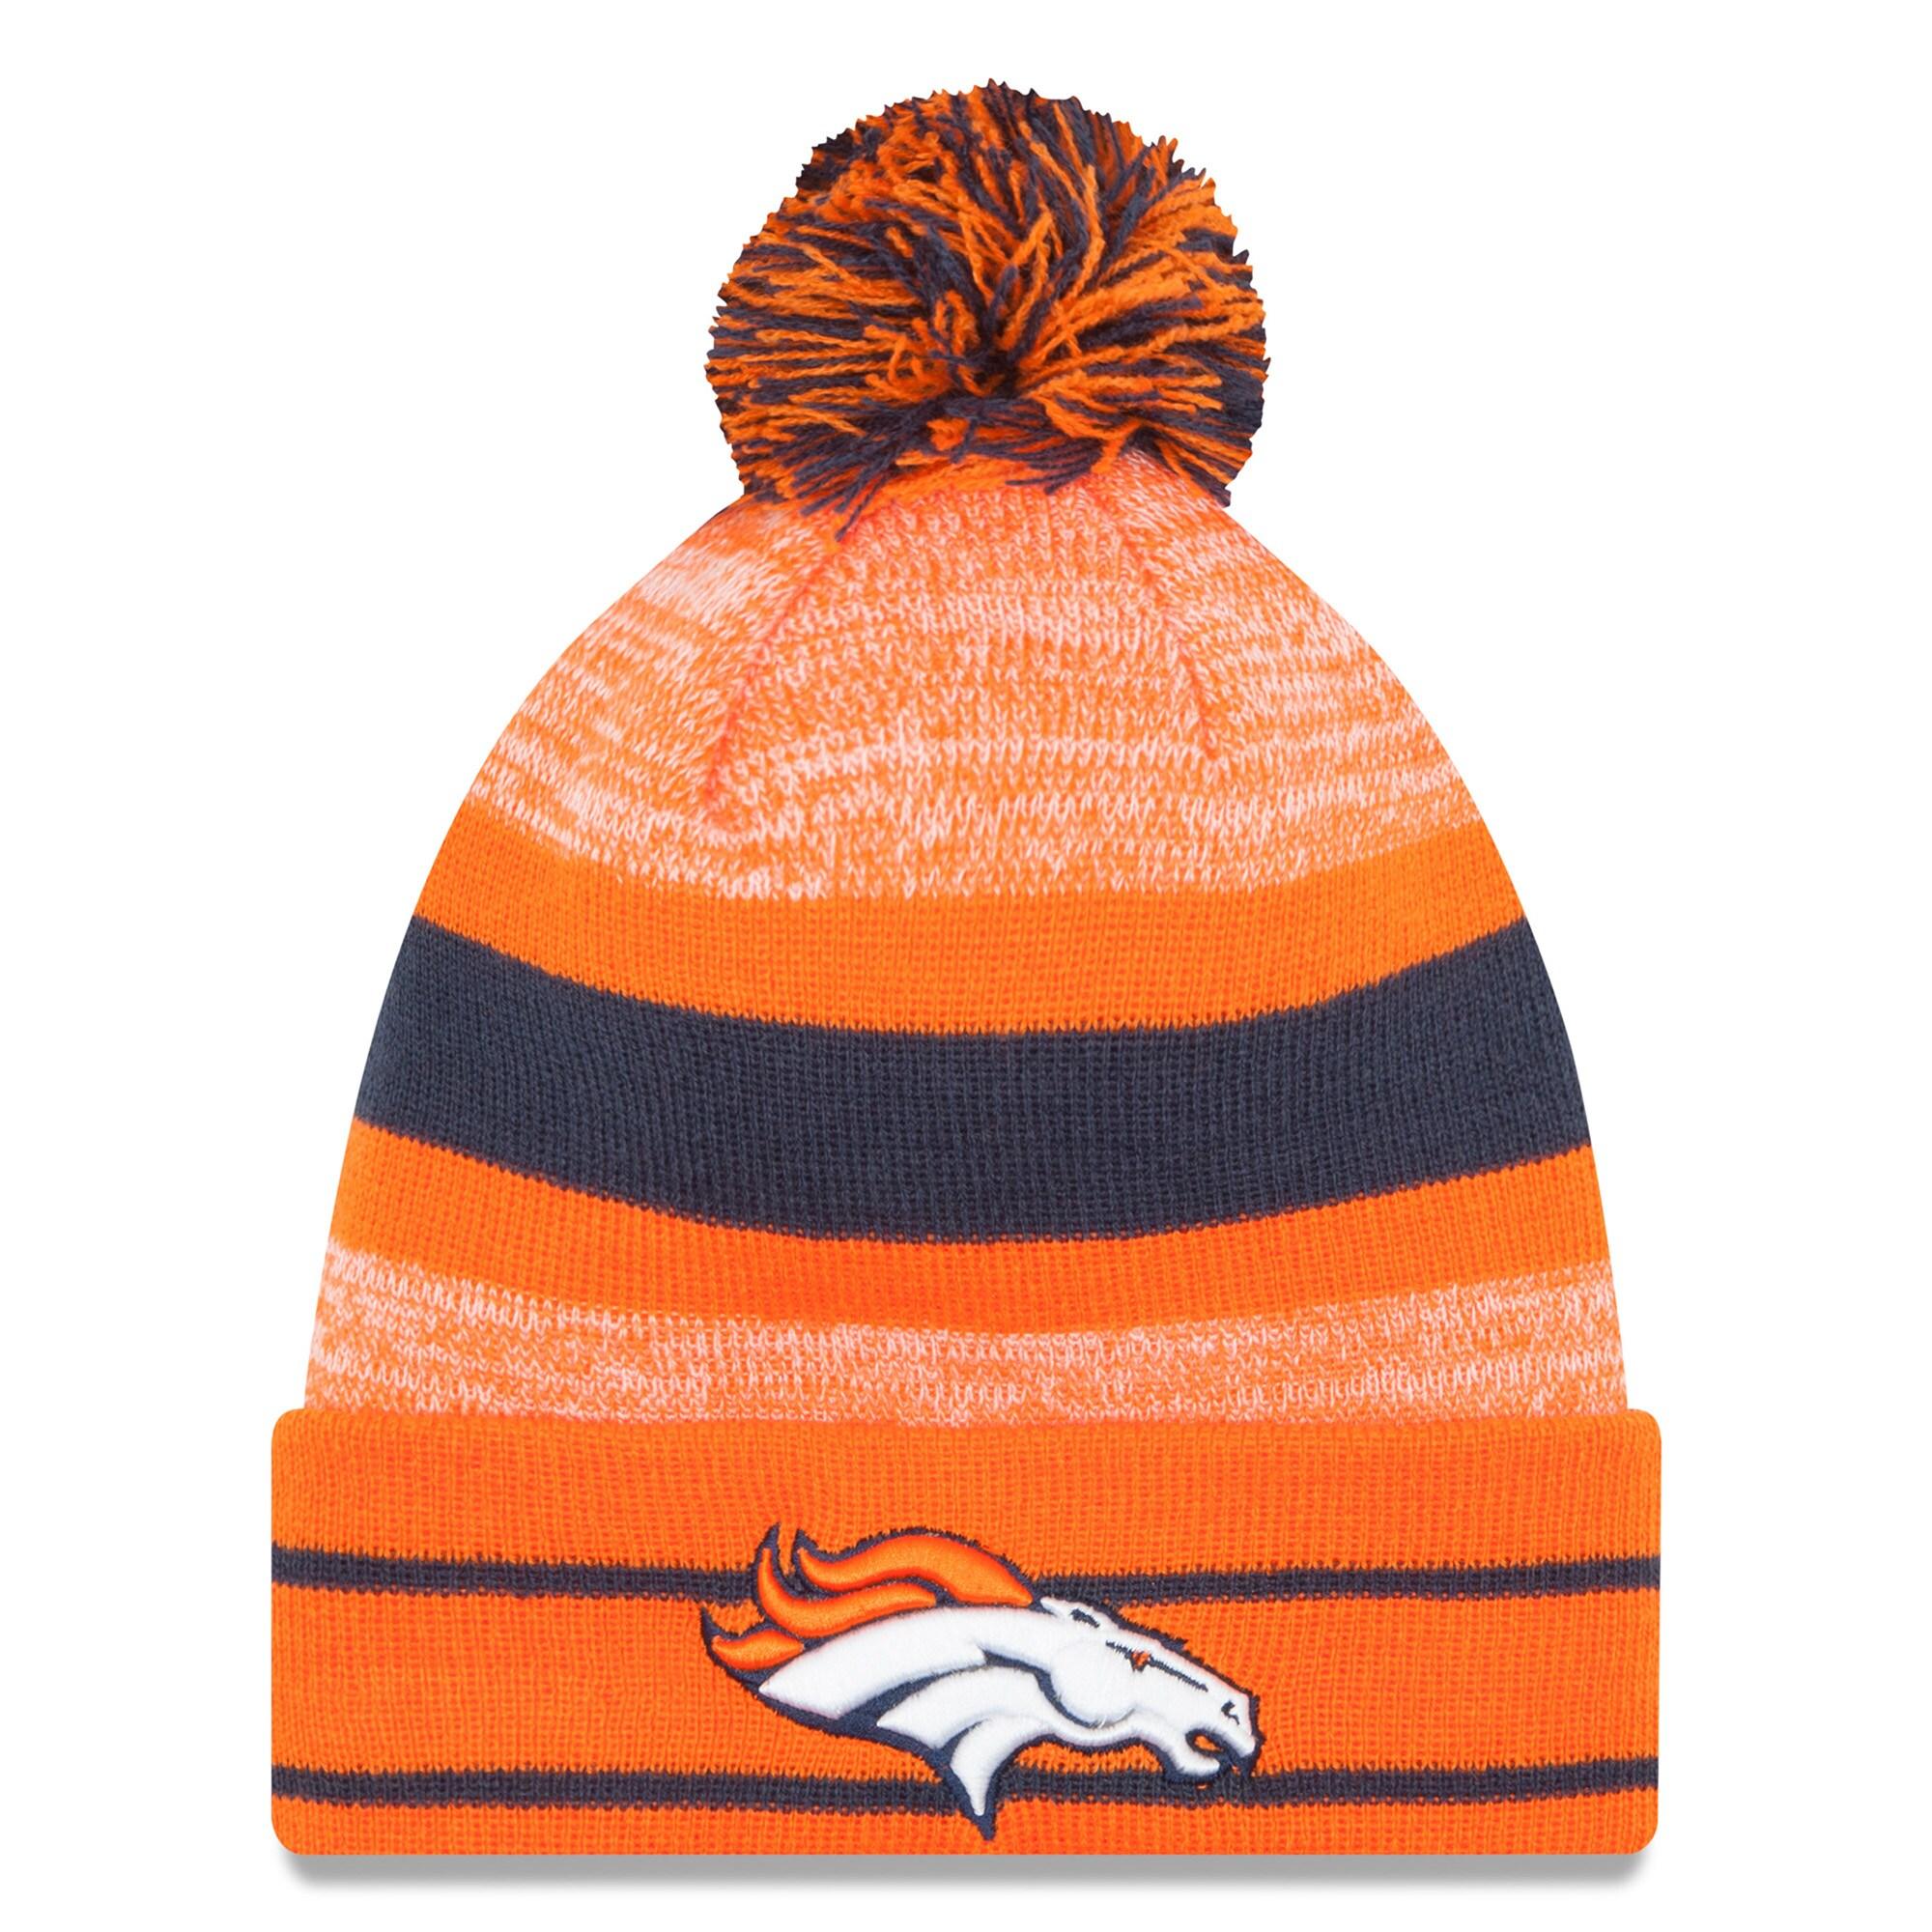 Denver Broncos New Era Team Logo Cuffed Knit Hat with Pom - Orange